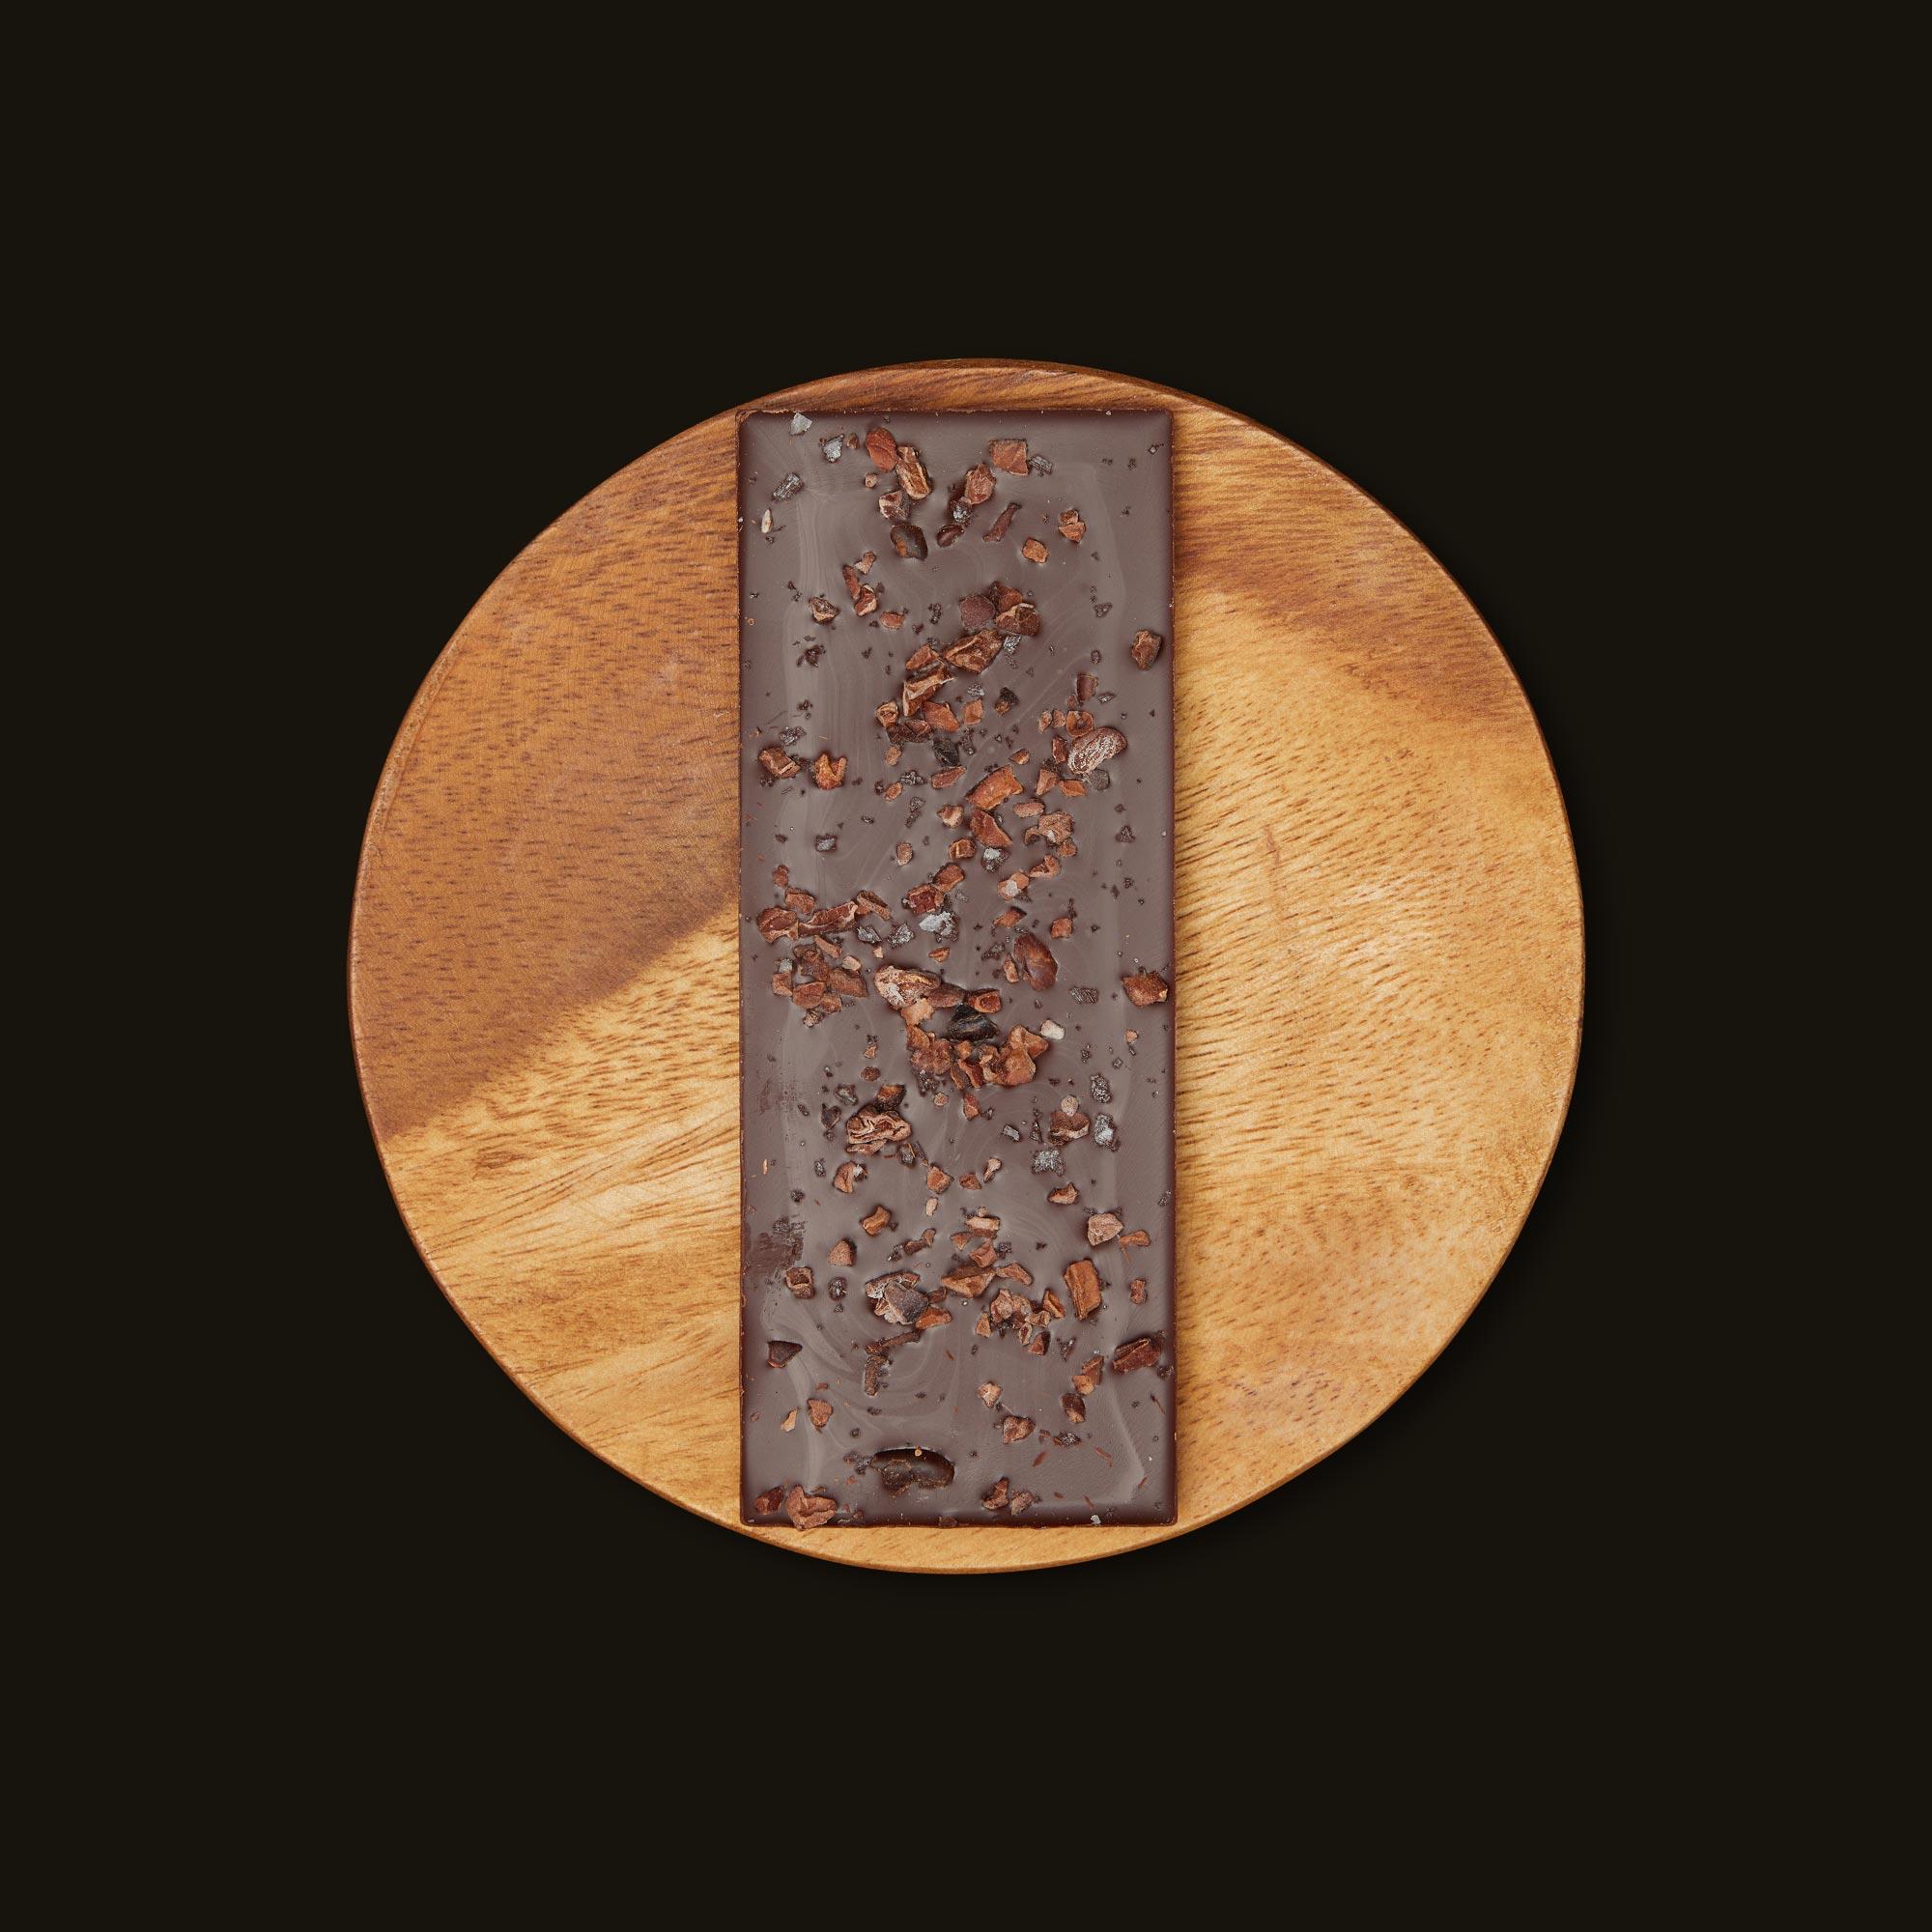 Serra Creativity 1:1 Salted Cacao Nib Chocolate Bar